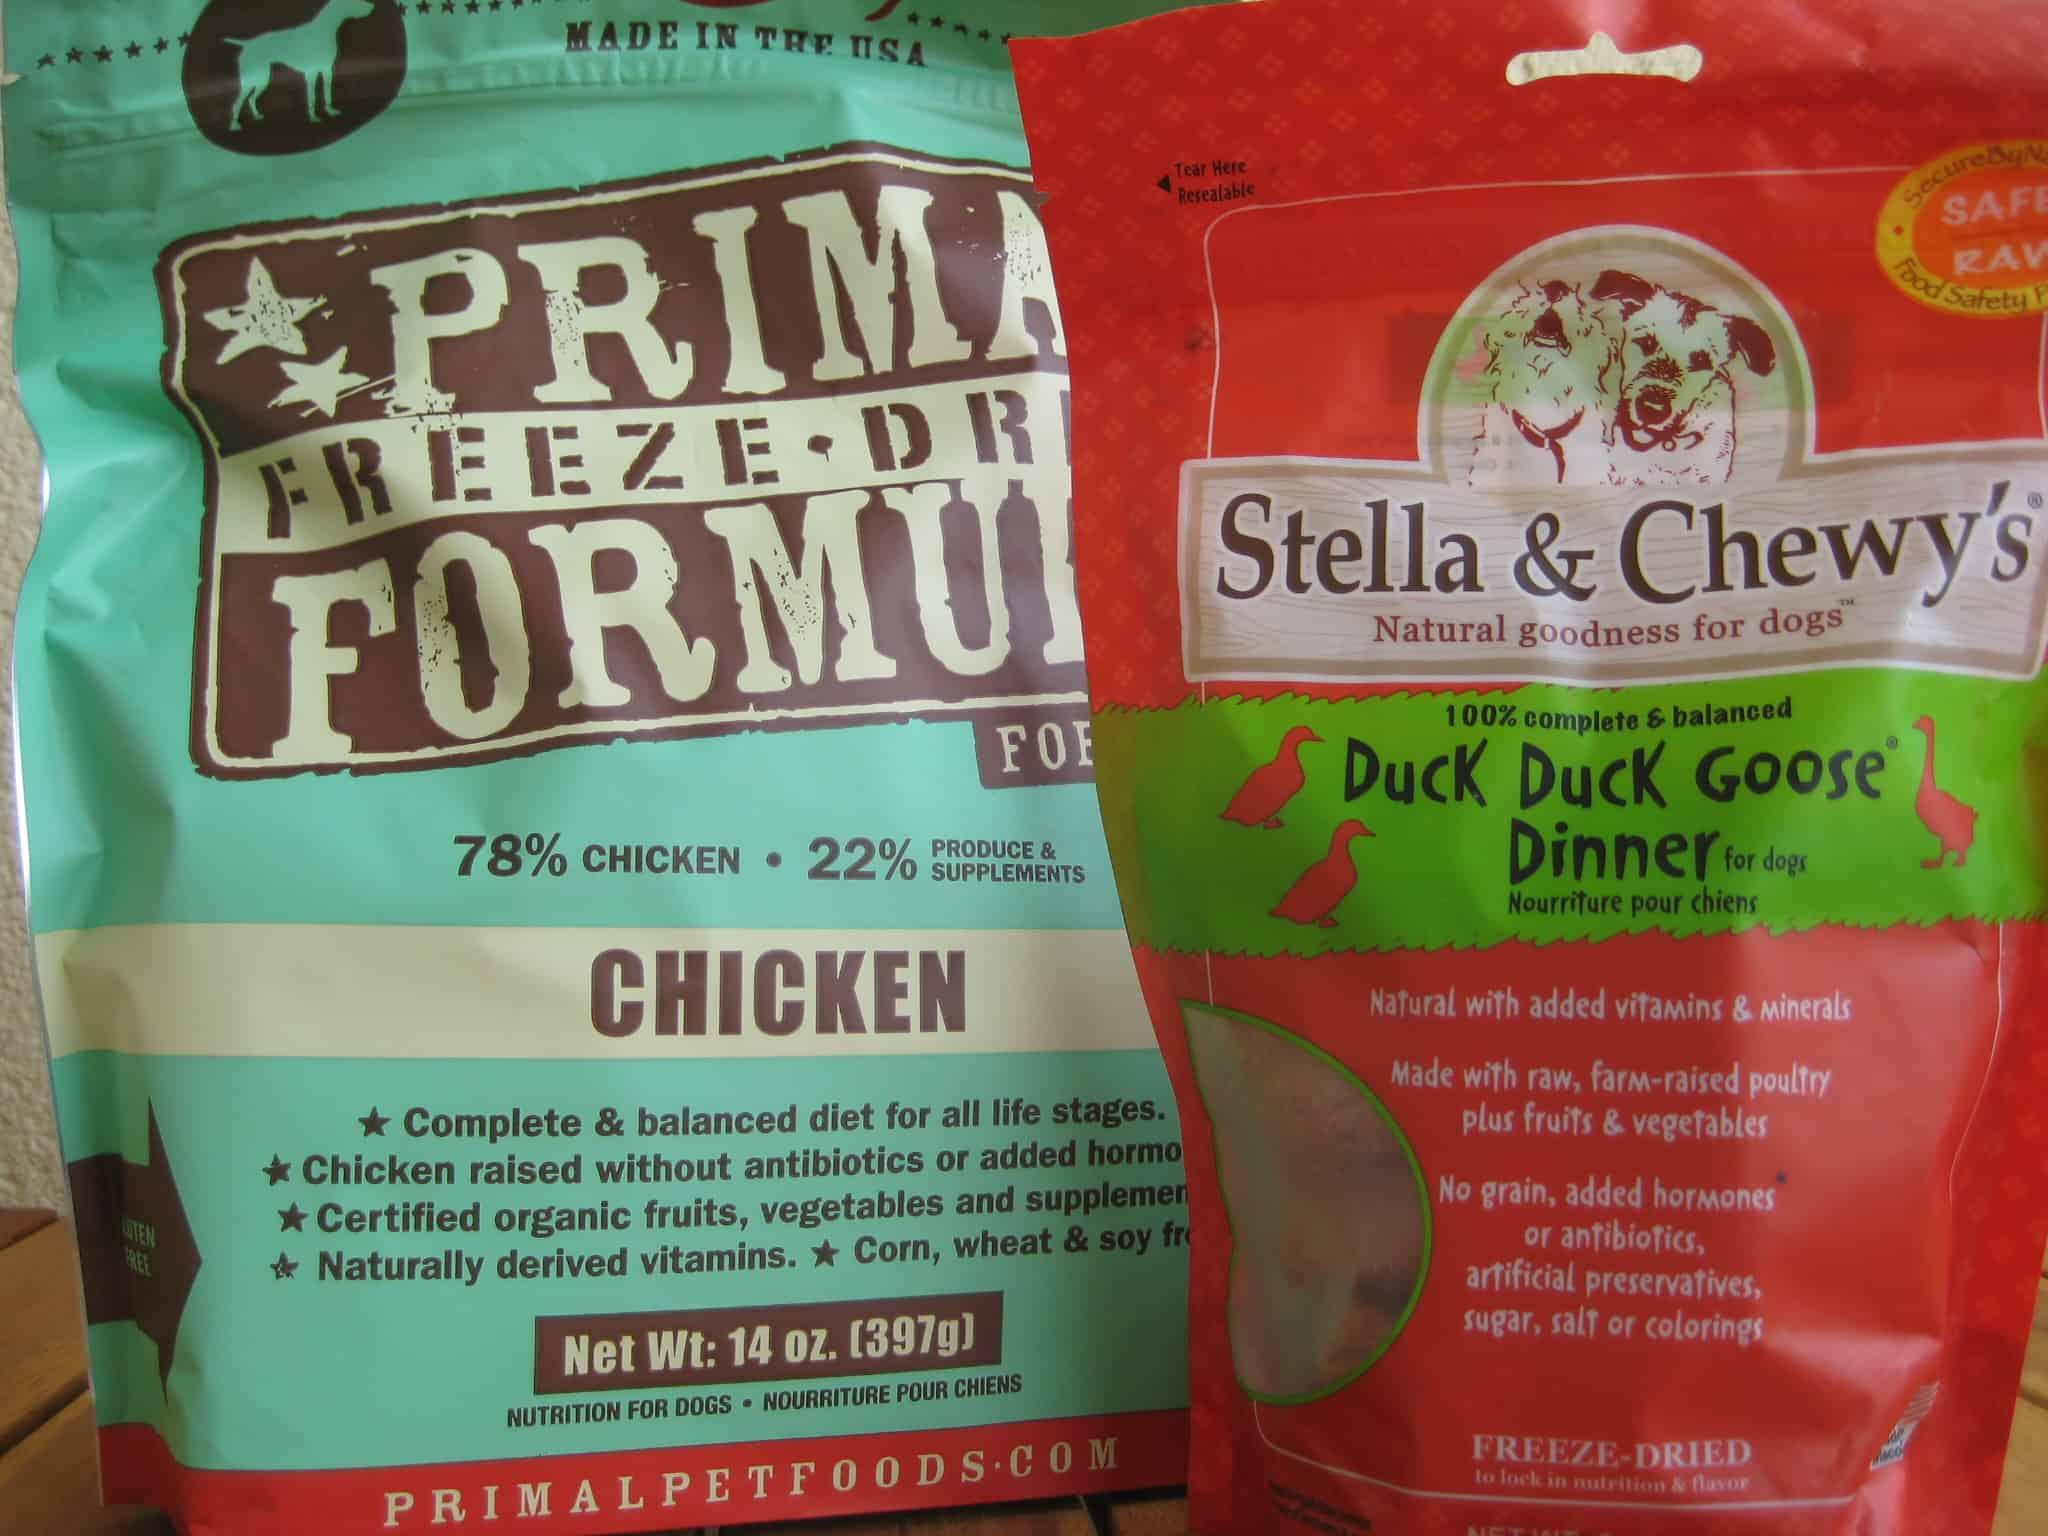 Prepackaged Frozen Dog Food